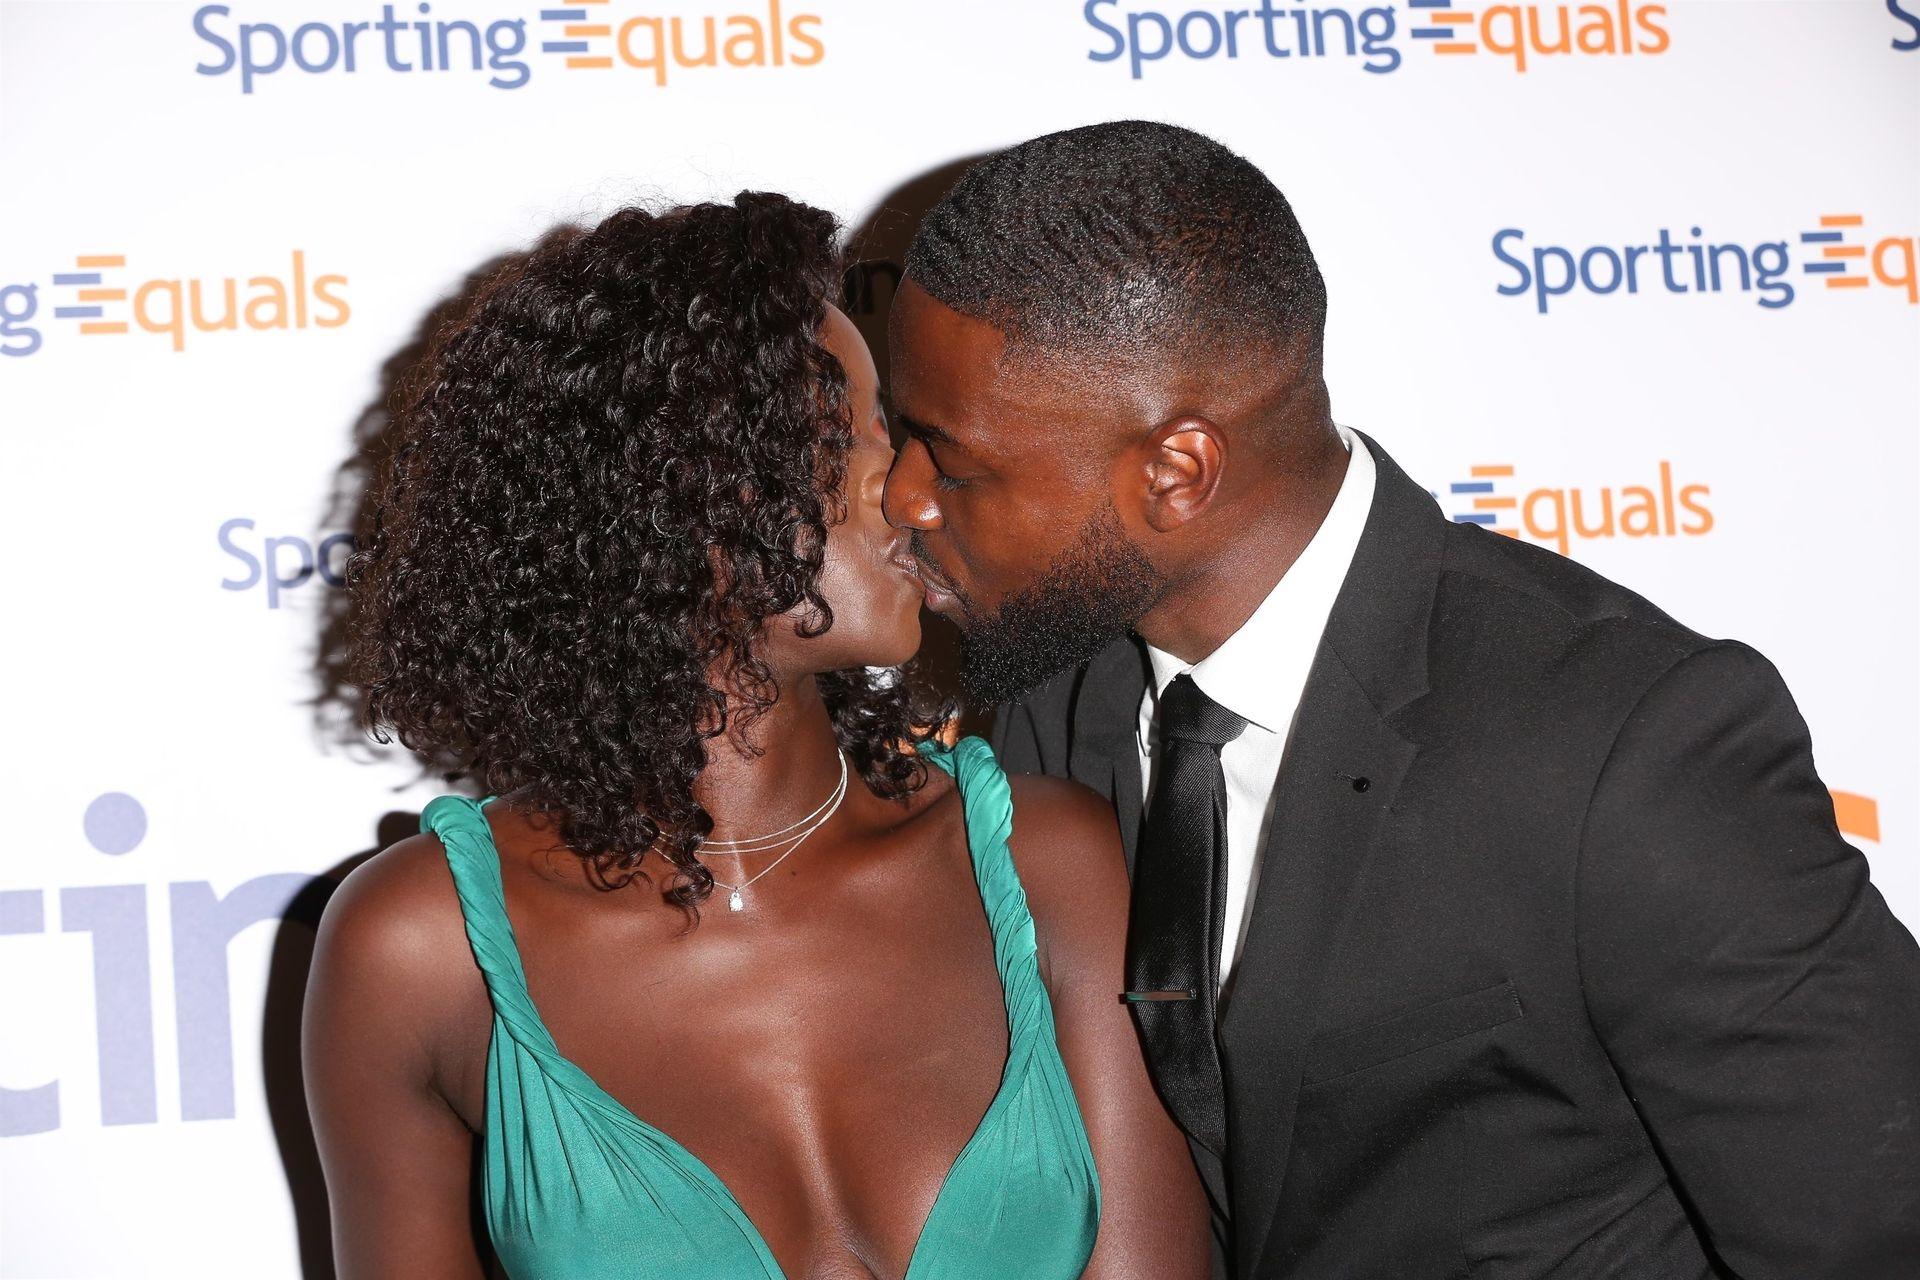 Mike Boateng & Priscilla Anyabu Are Seen At British Ethnic Diversity Sports Awards 0104